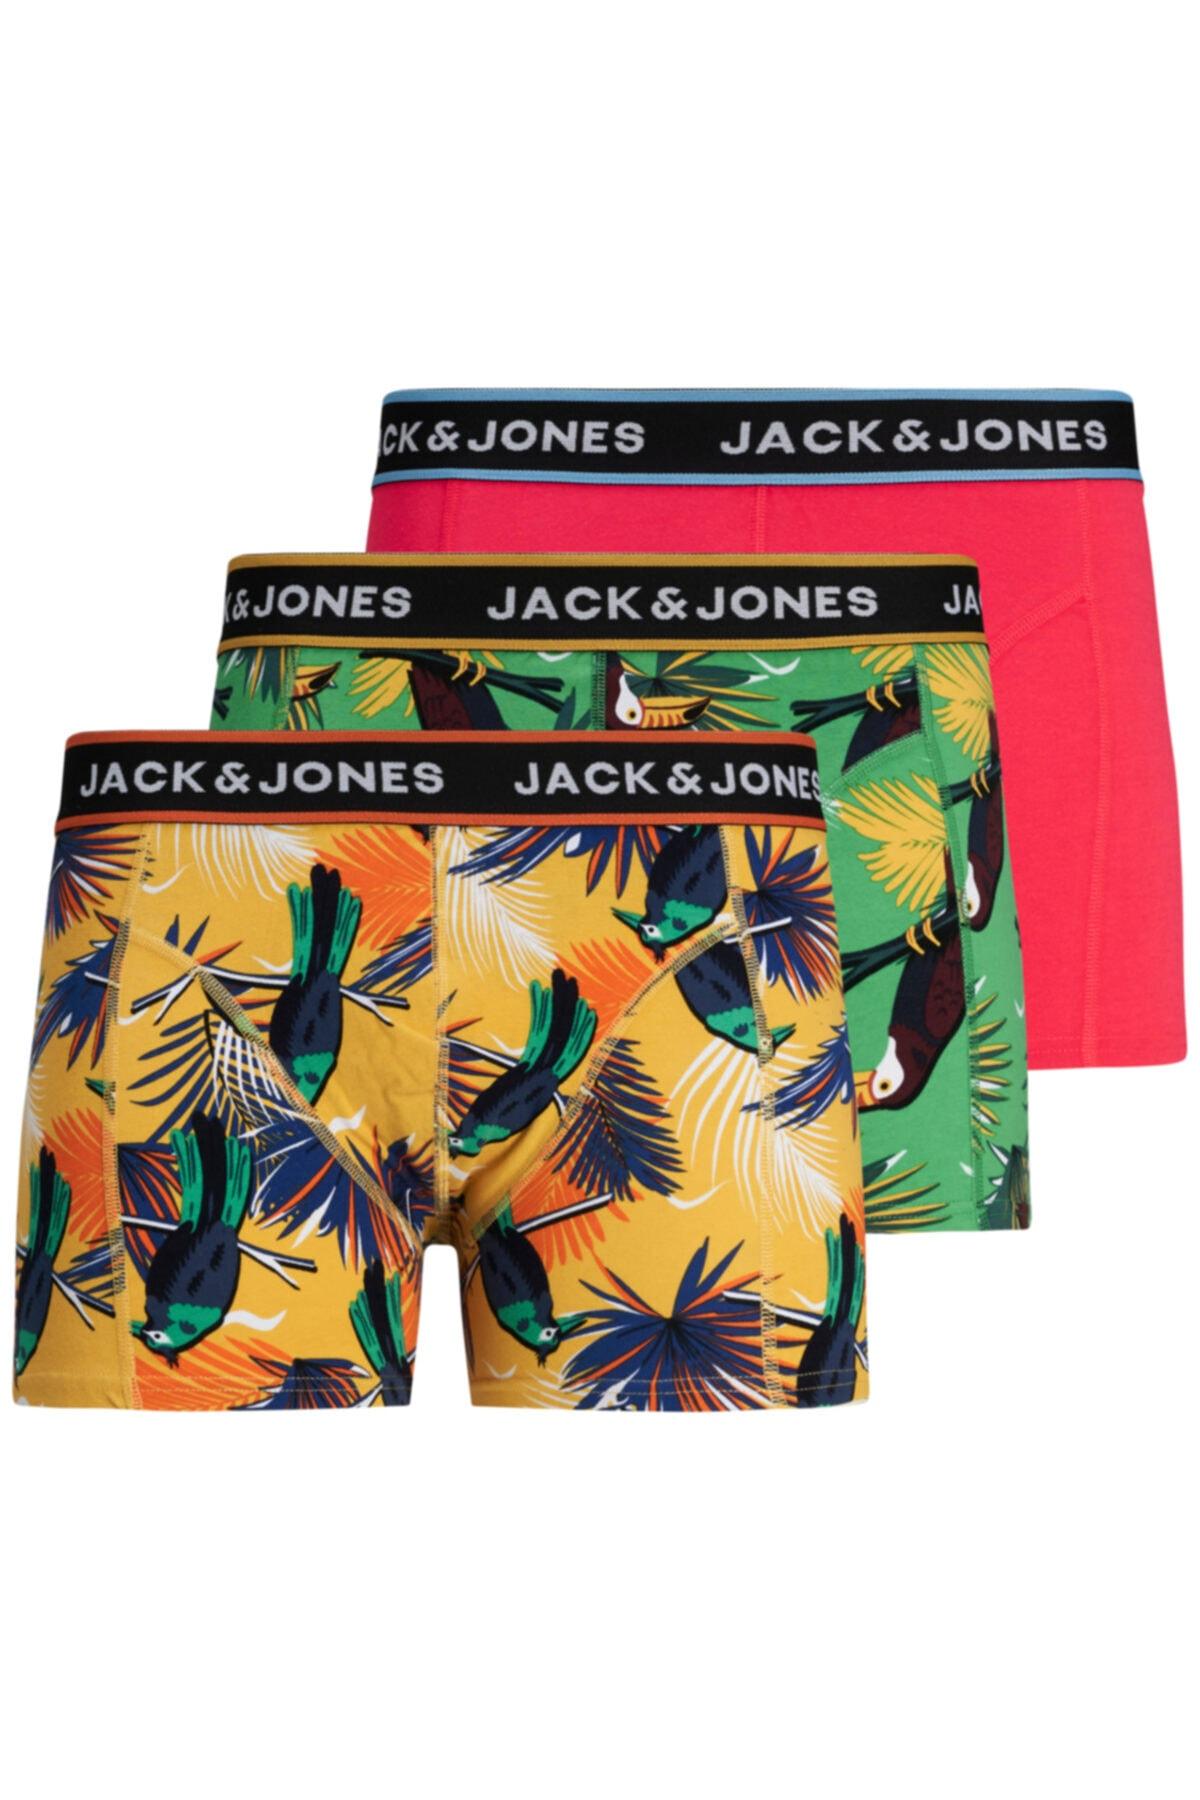 Jack & Jones Jack Jones Summer Anımals 3 Lü Paket Erkek Boxer 1